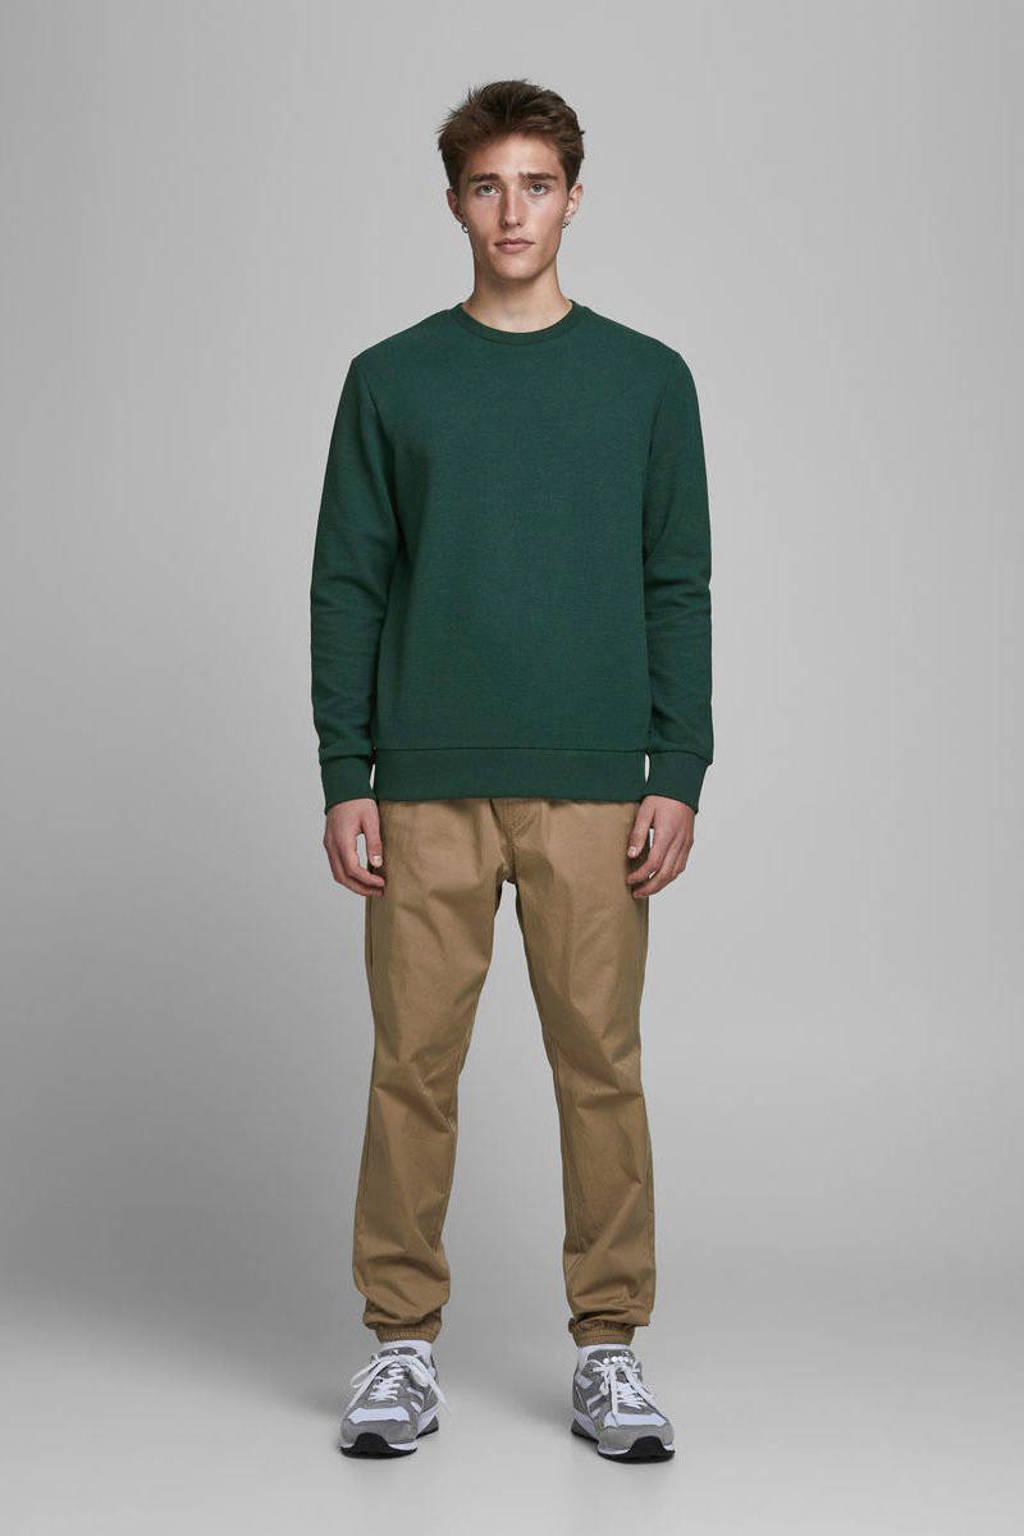 JACK & JONES CORE sweater donkergroen, Donkergroen